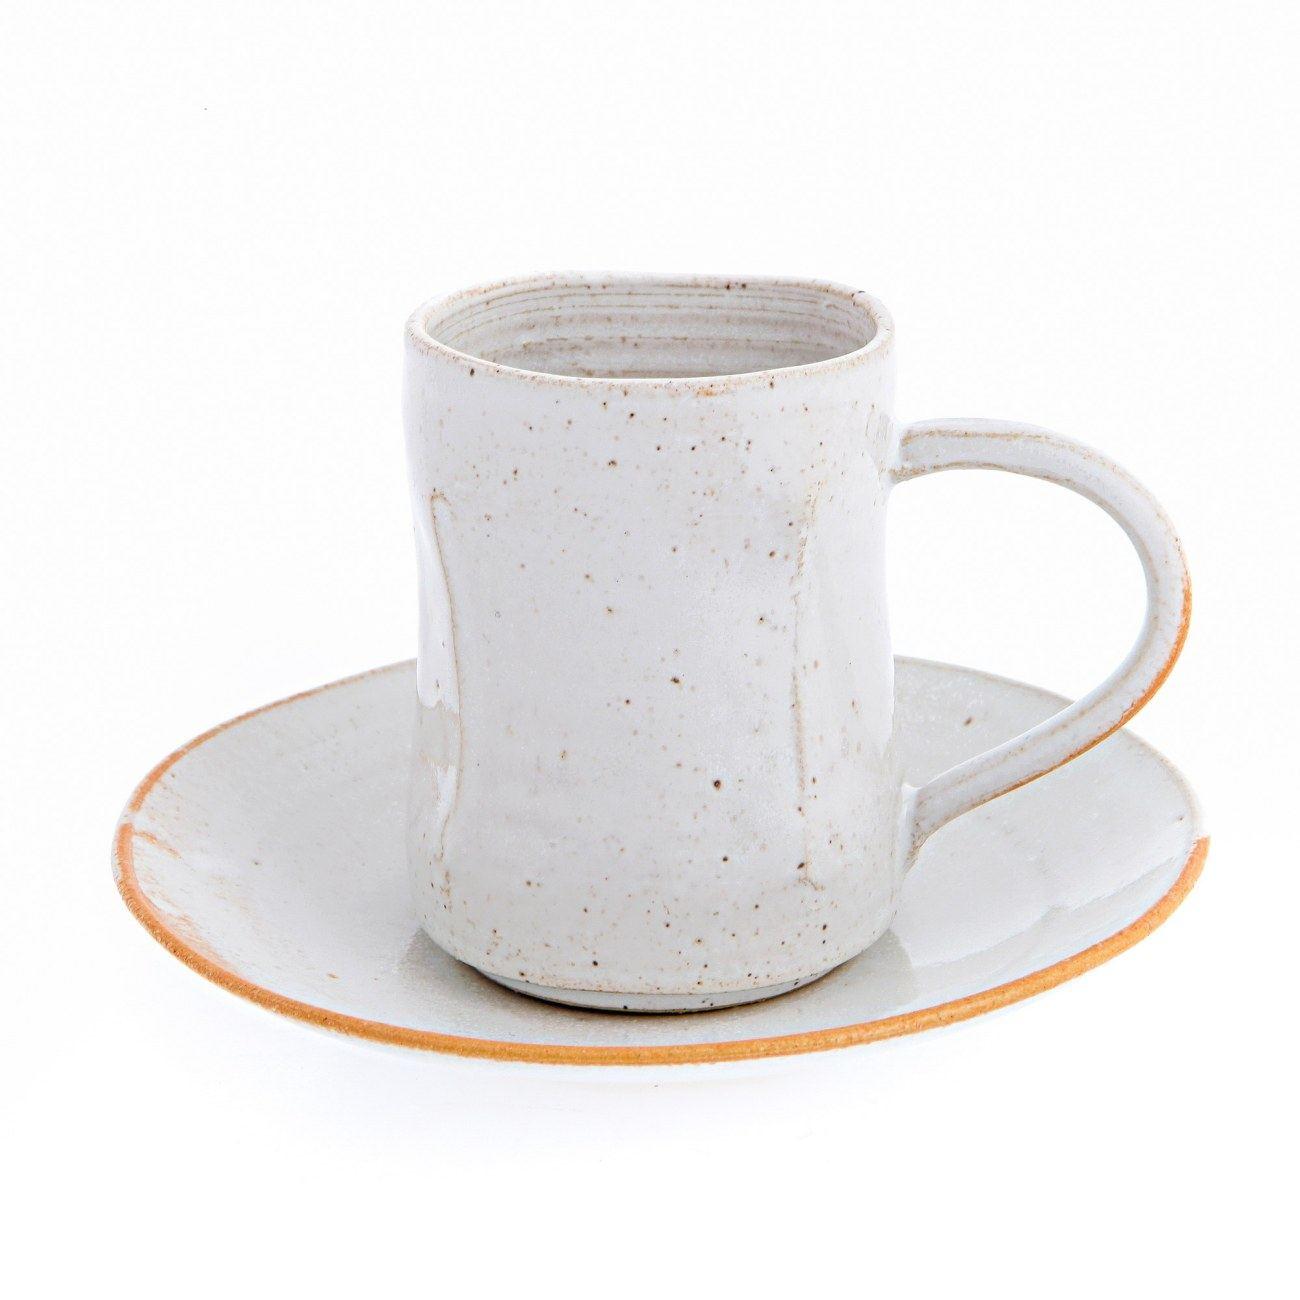 modern coffee cup - tea coffee cup and saucer modern handmade ceramic serving set